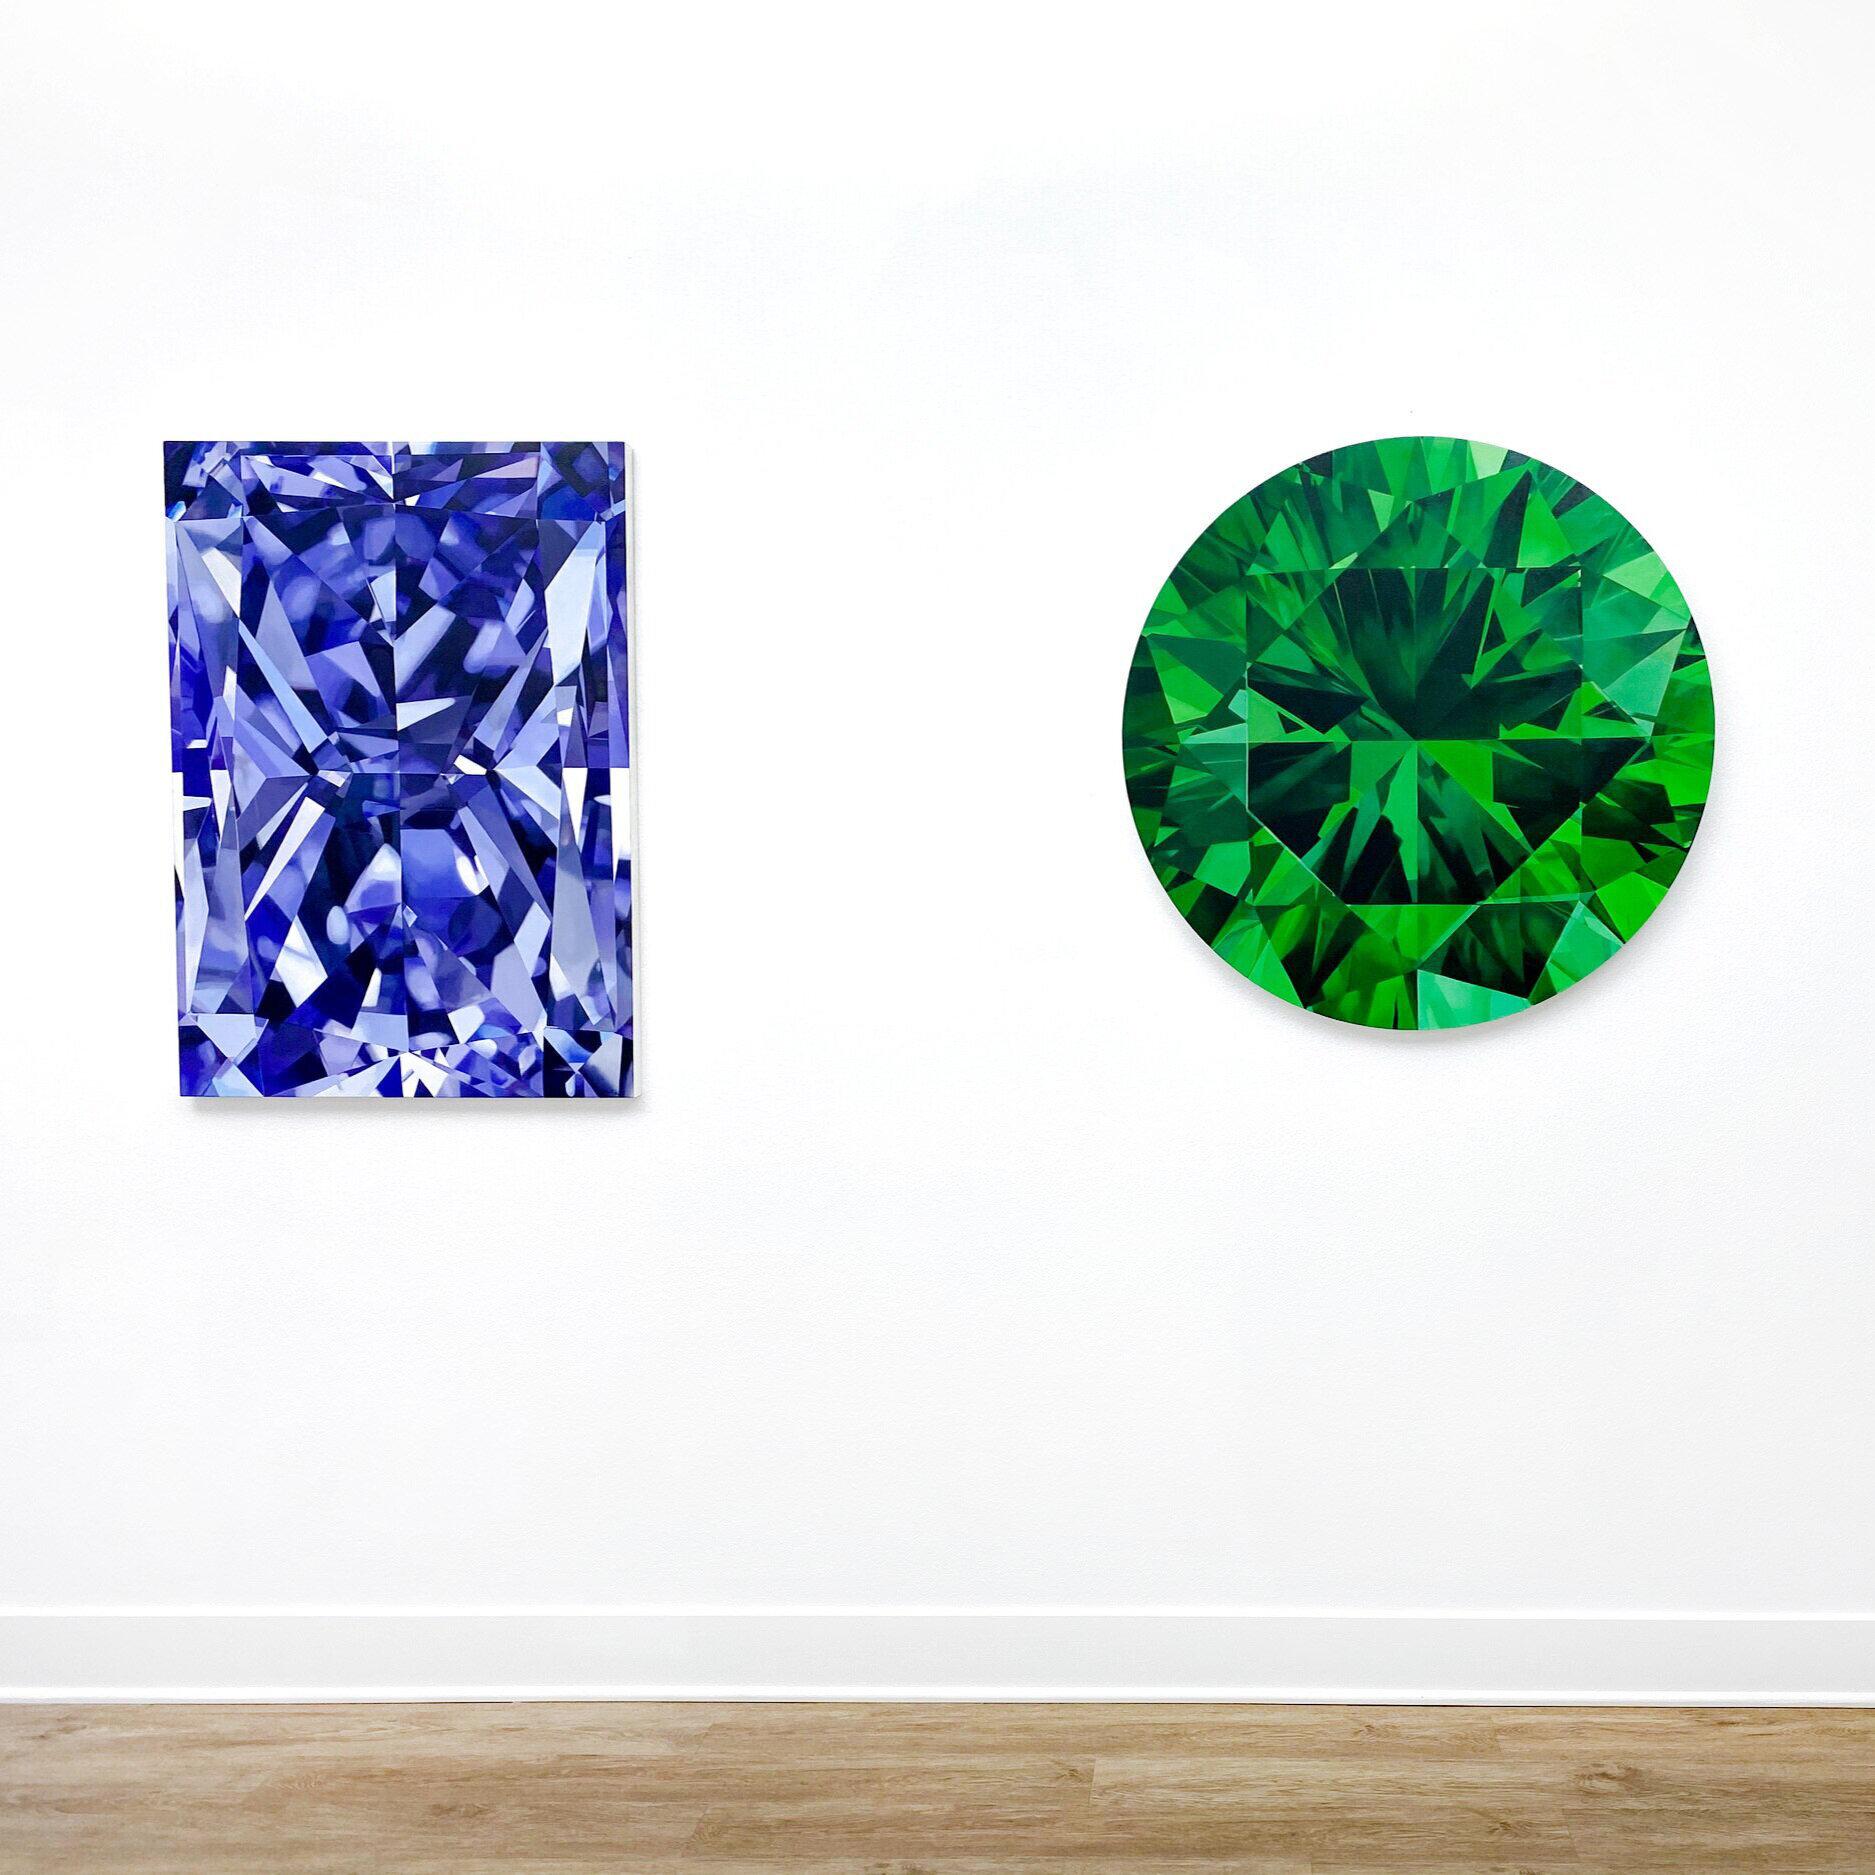 Violette & Greenhouse II